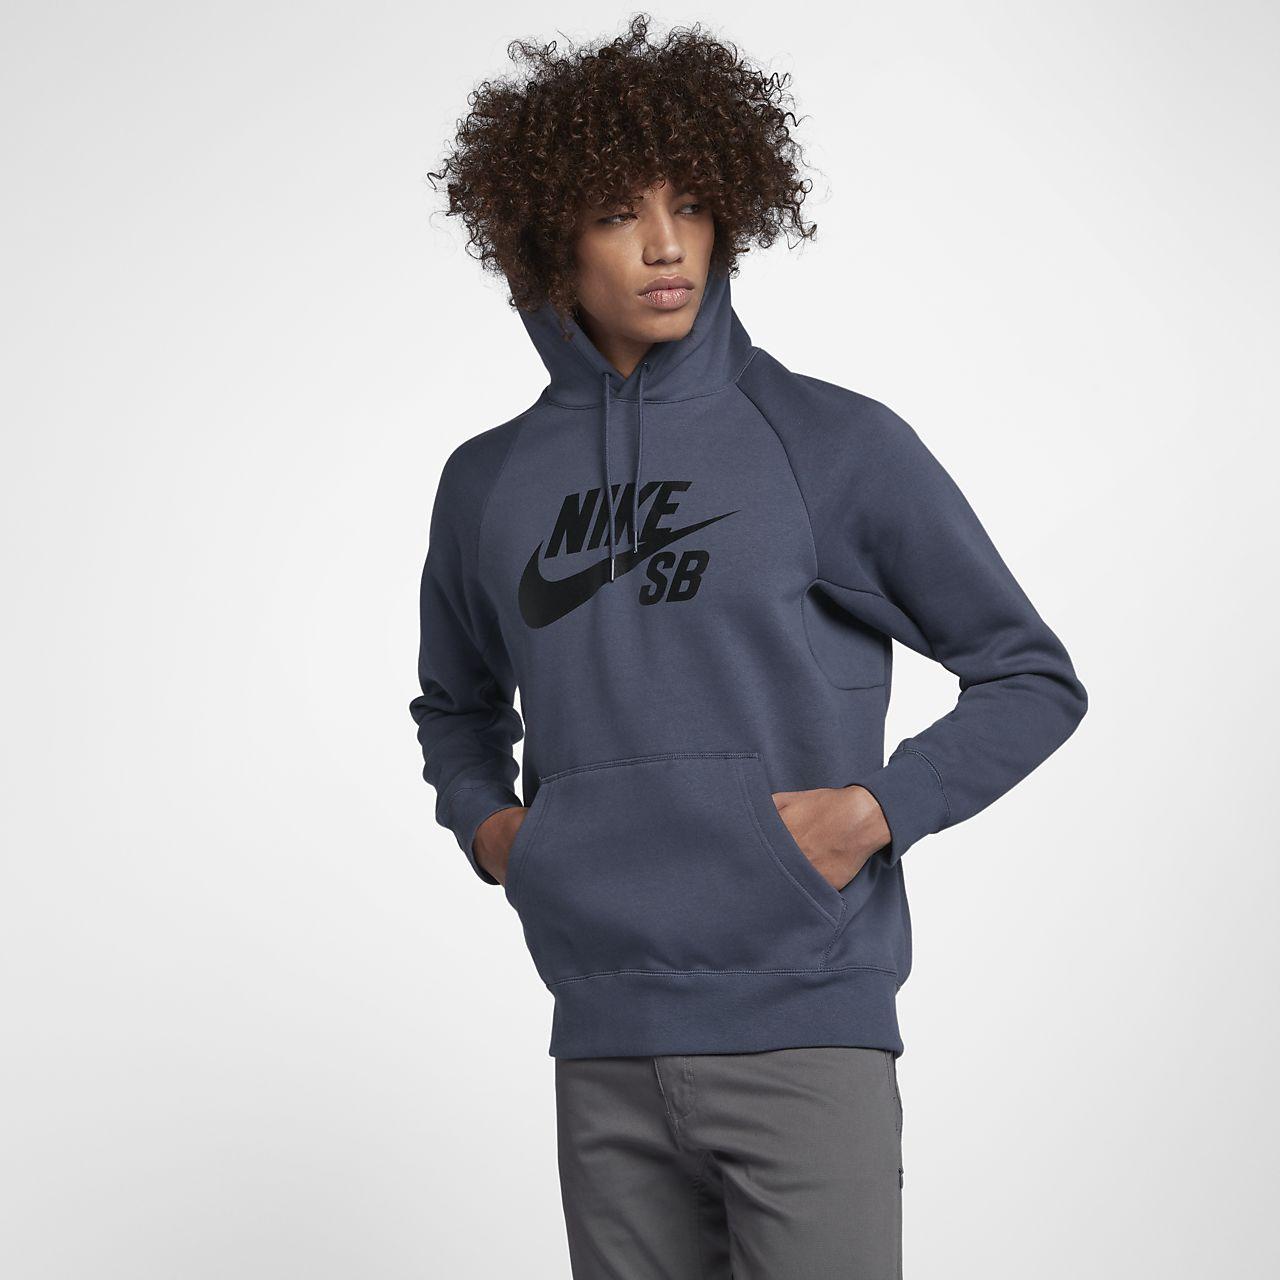 f0ab4663d9d4 Nike SB Icon Men s Hoodie. Nike.com AU